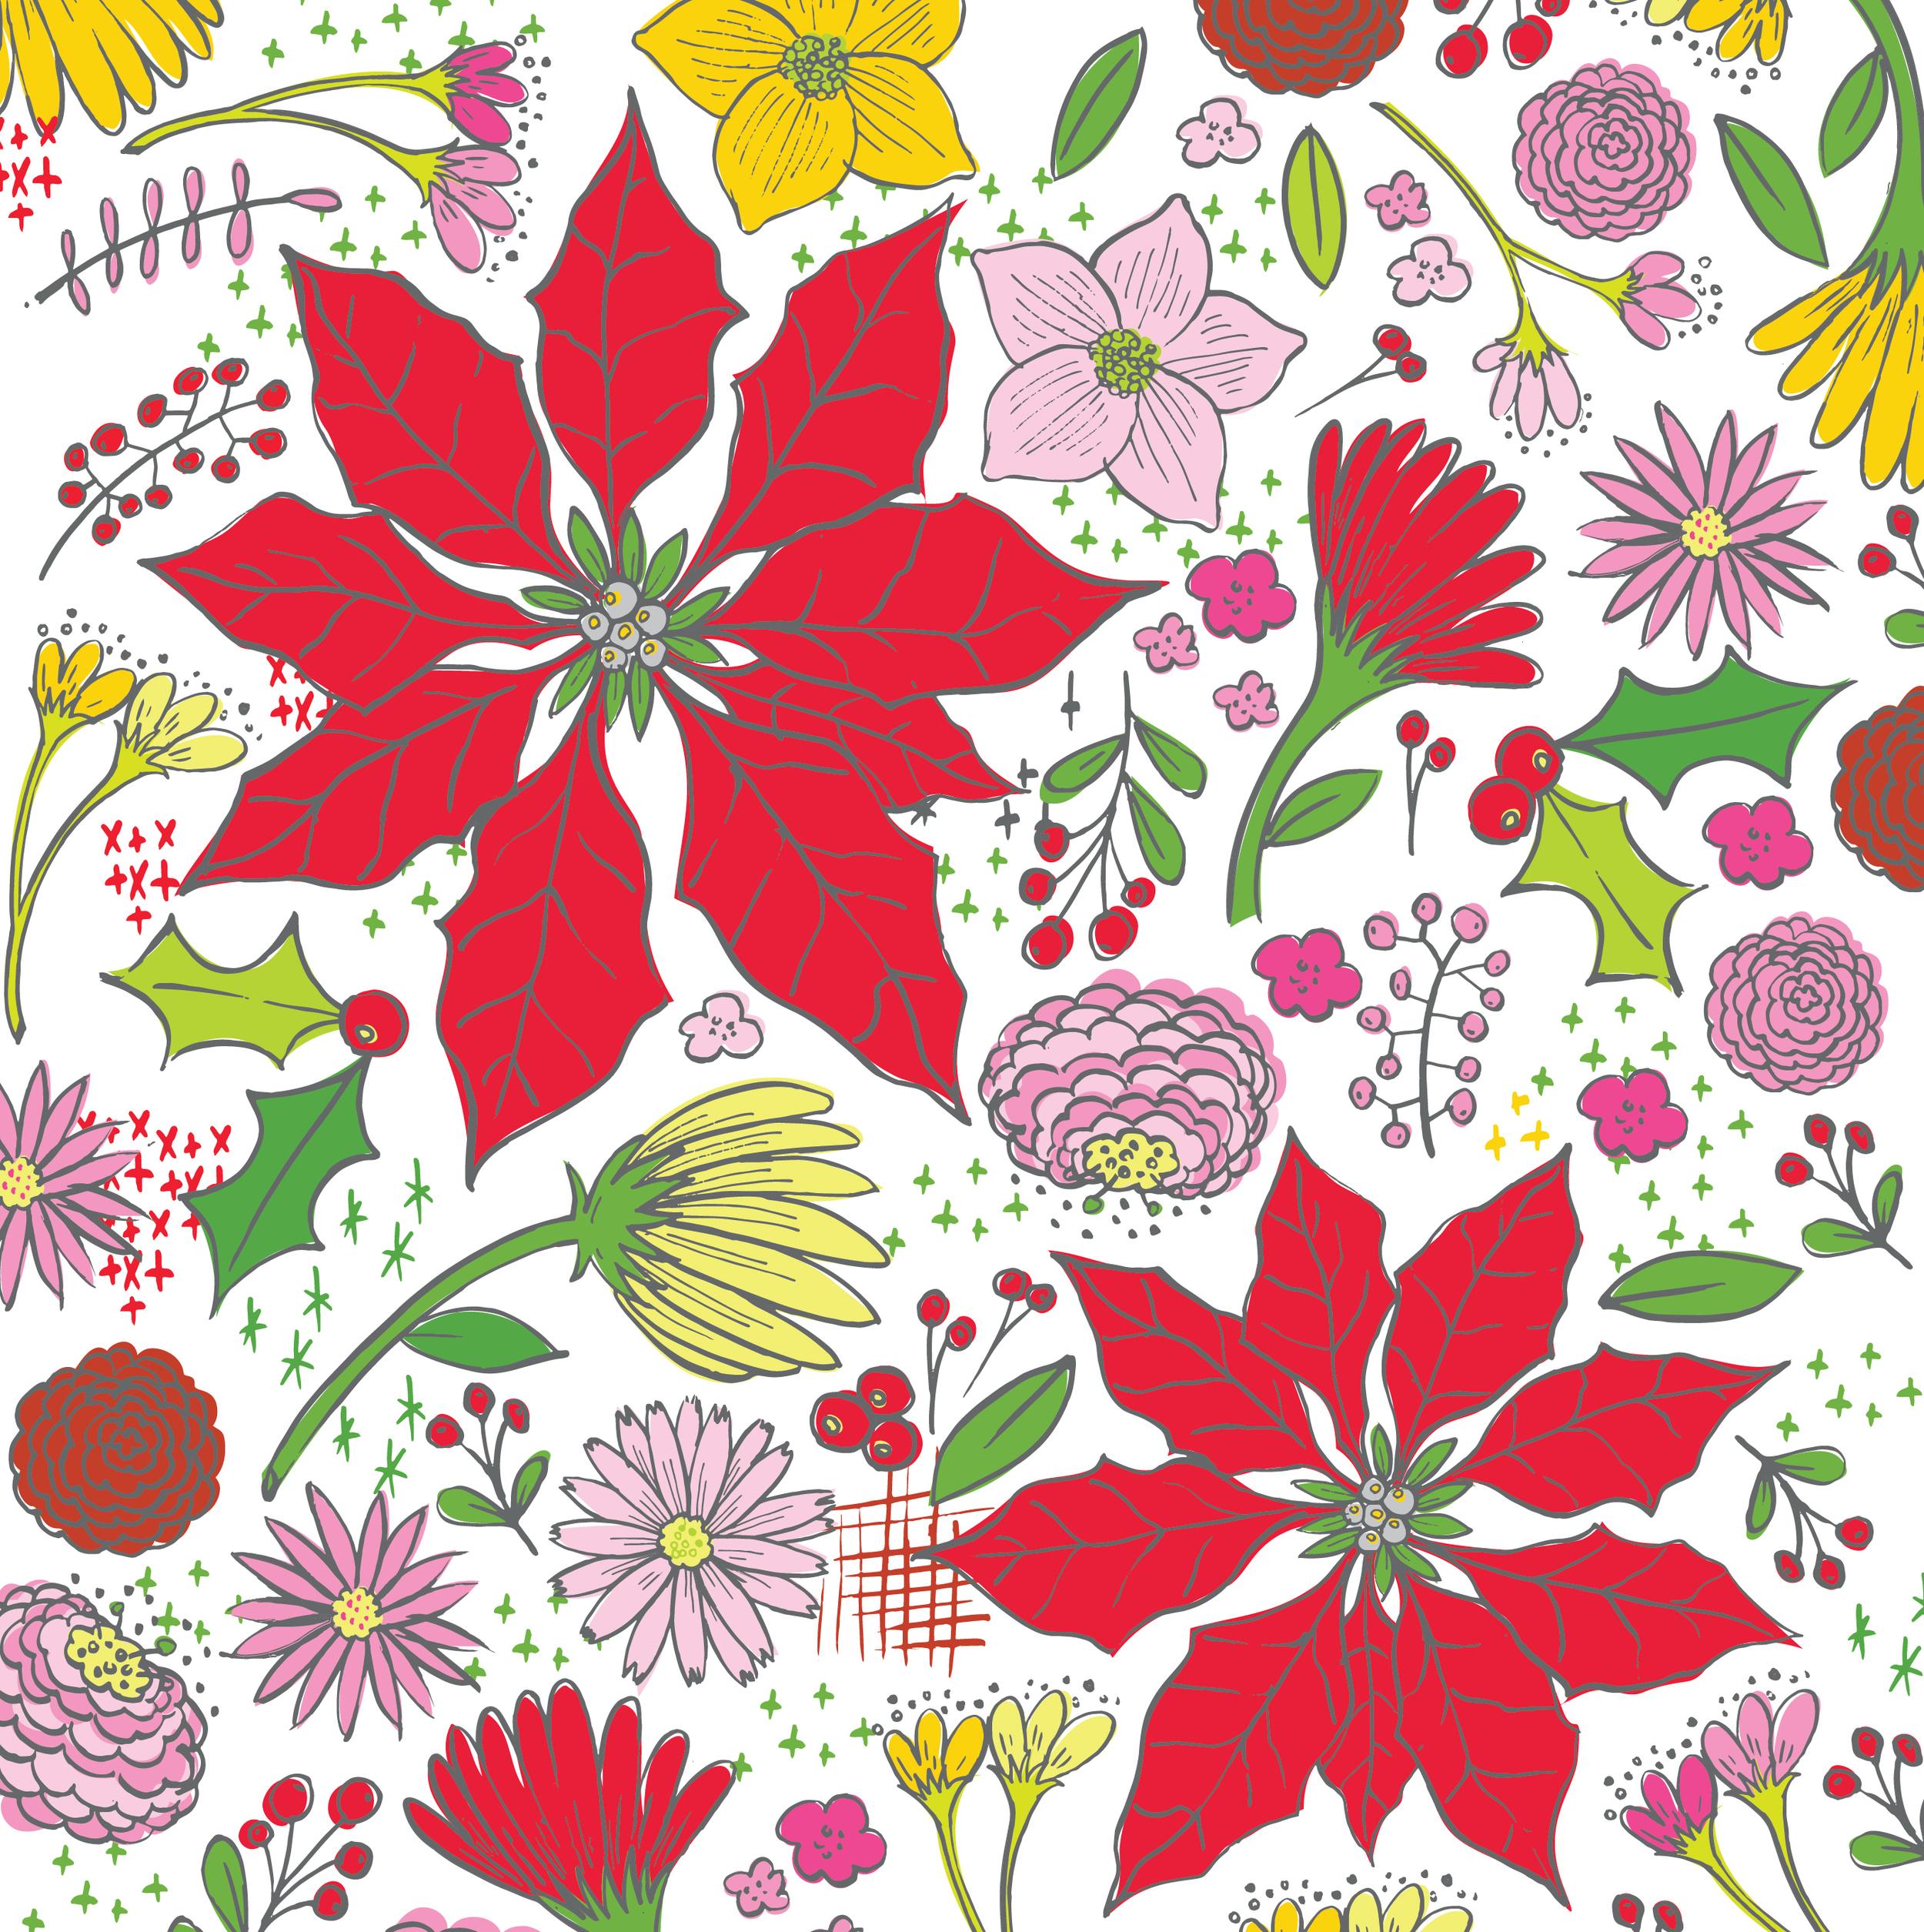 Floral HolidayAmyLFrazer.jpg